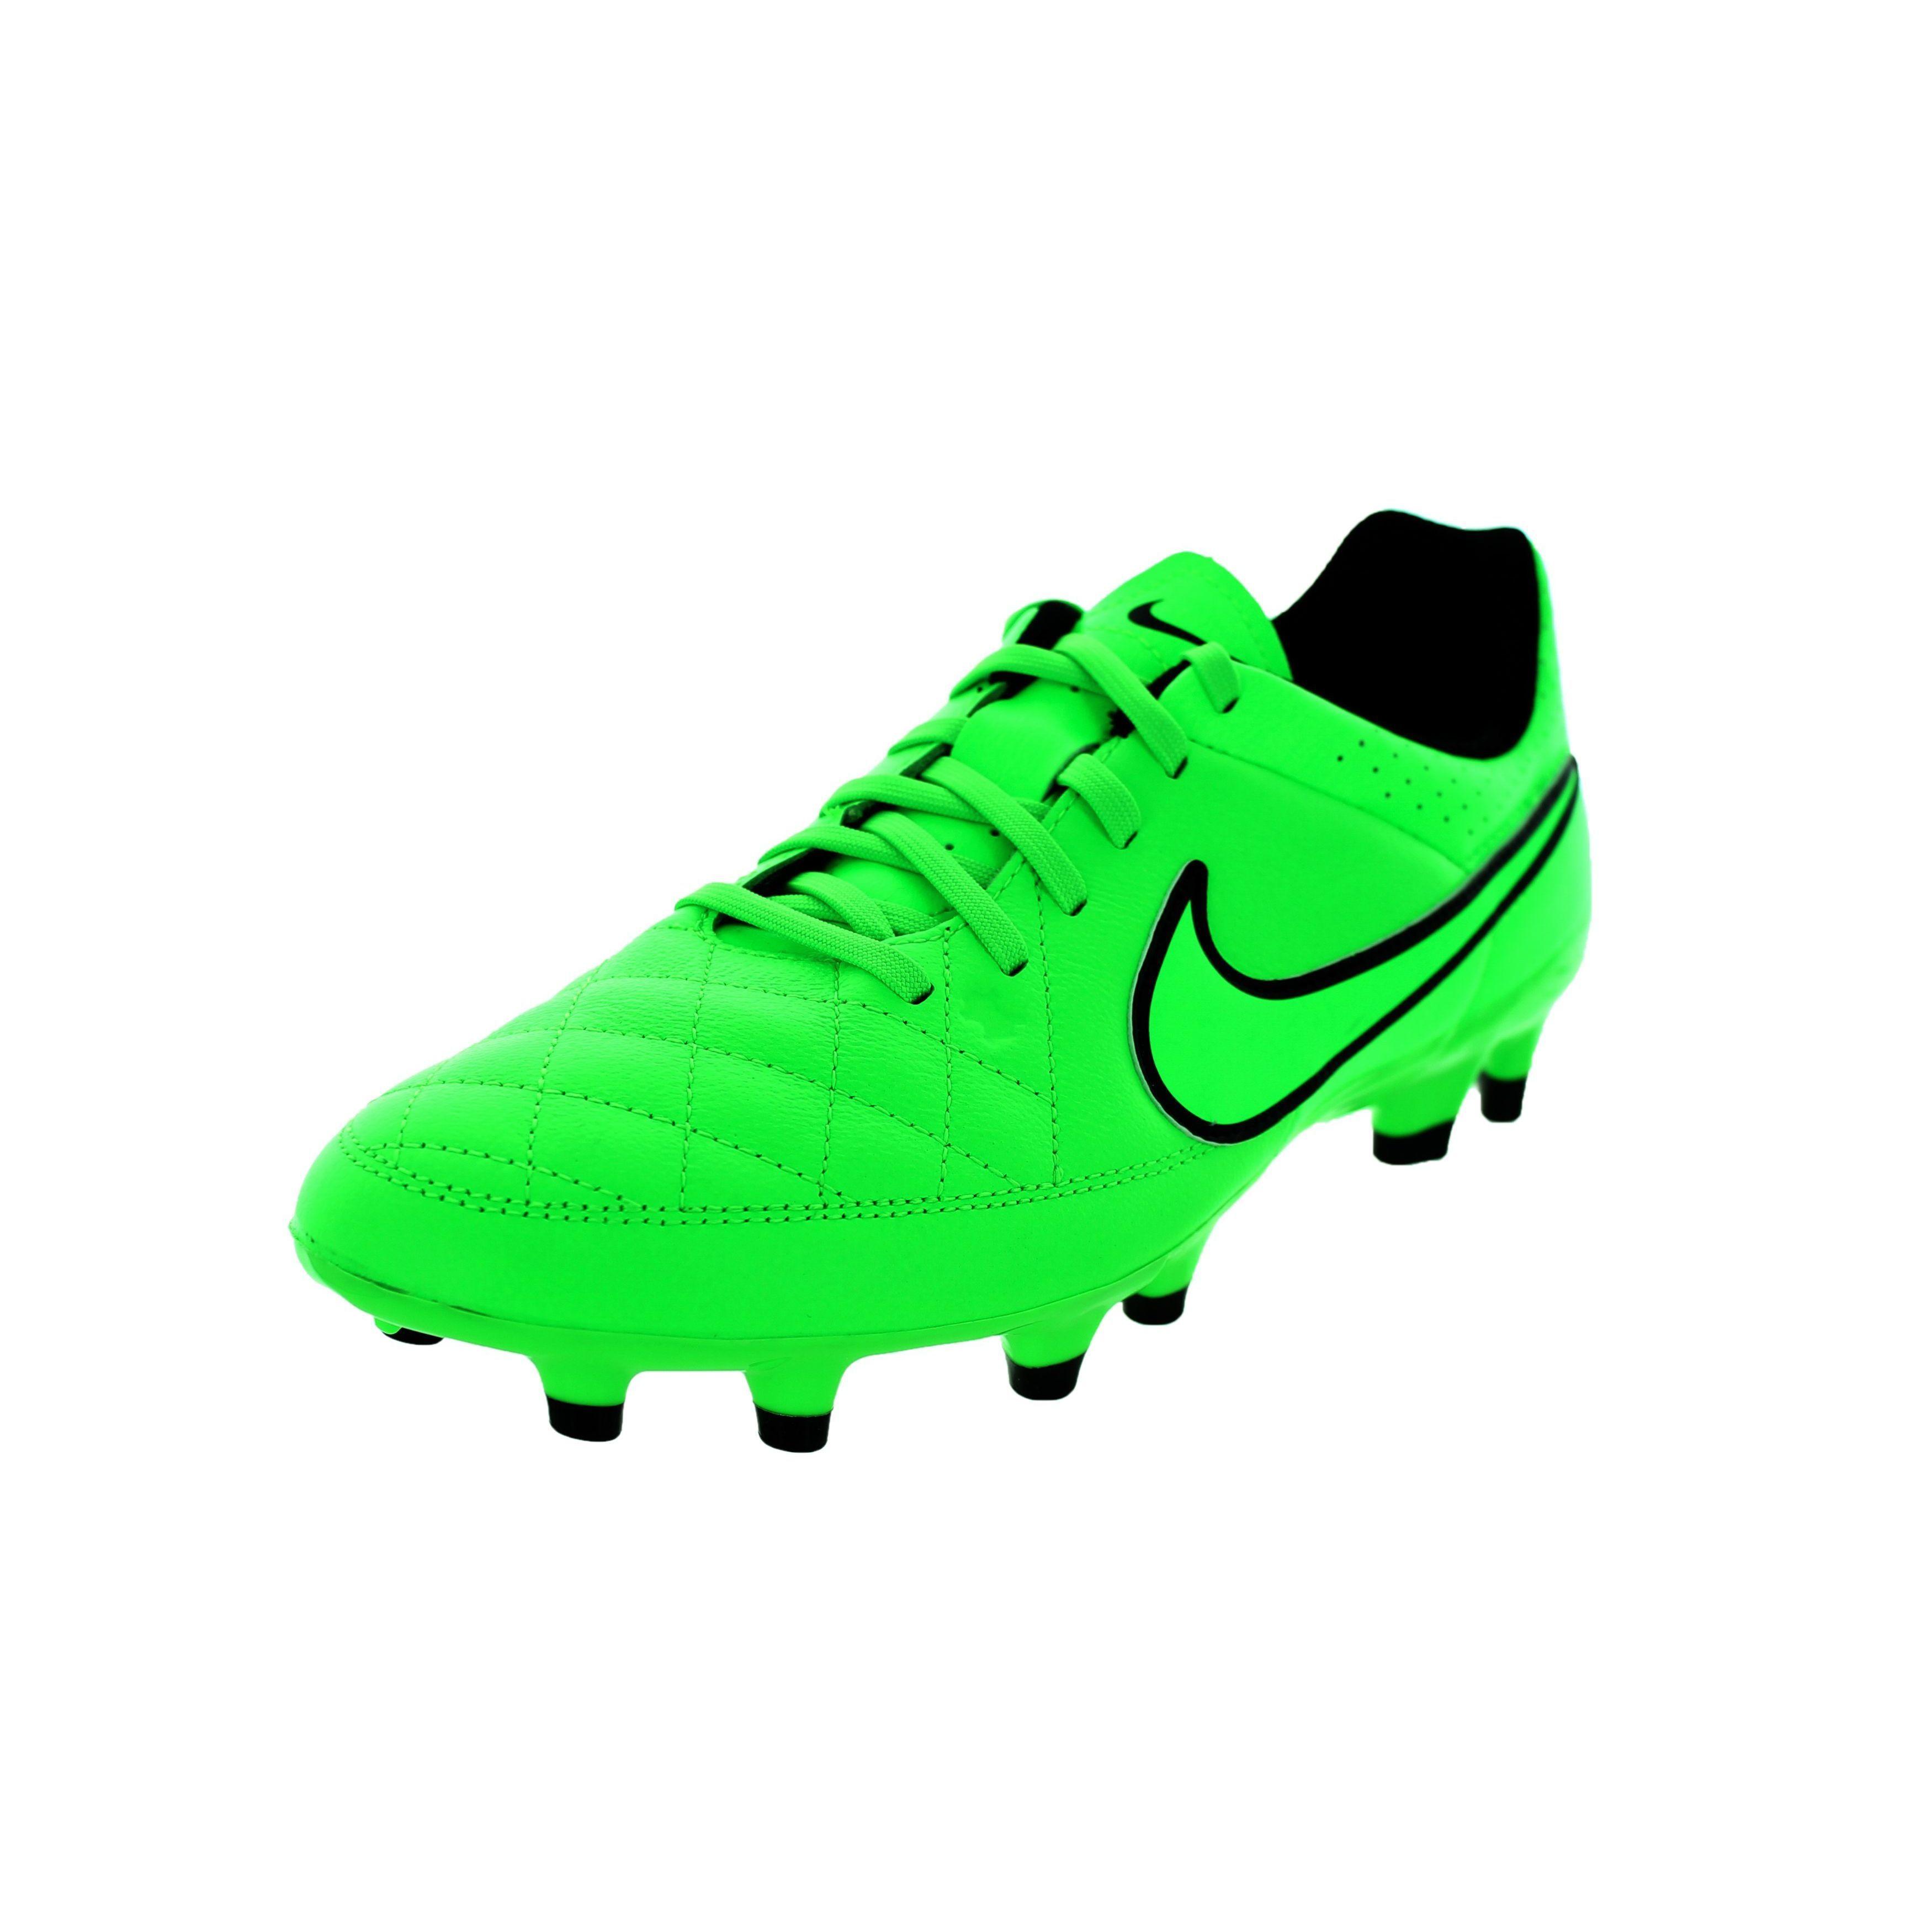 28++ Nike tech craft football boots information